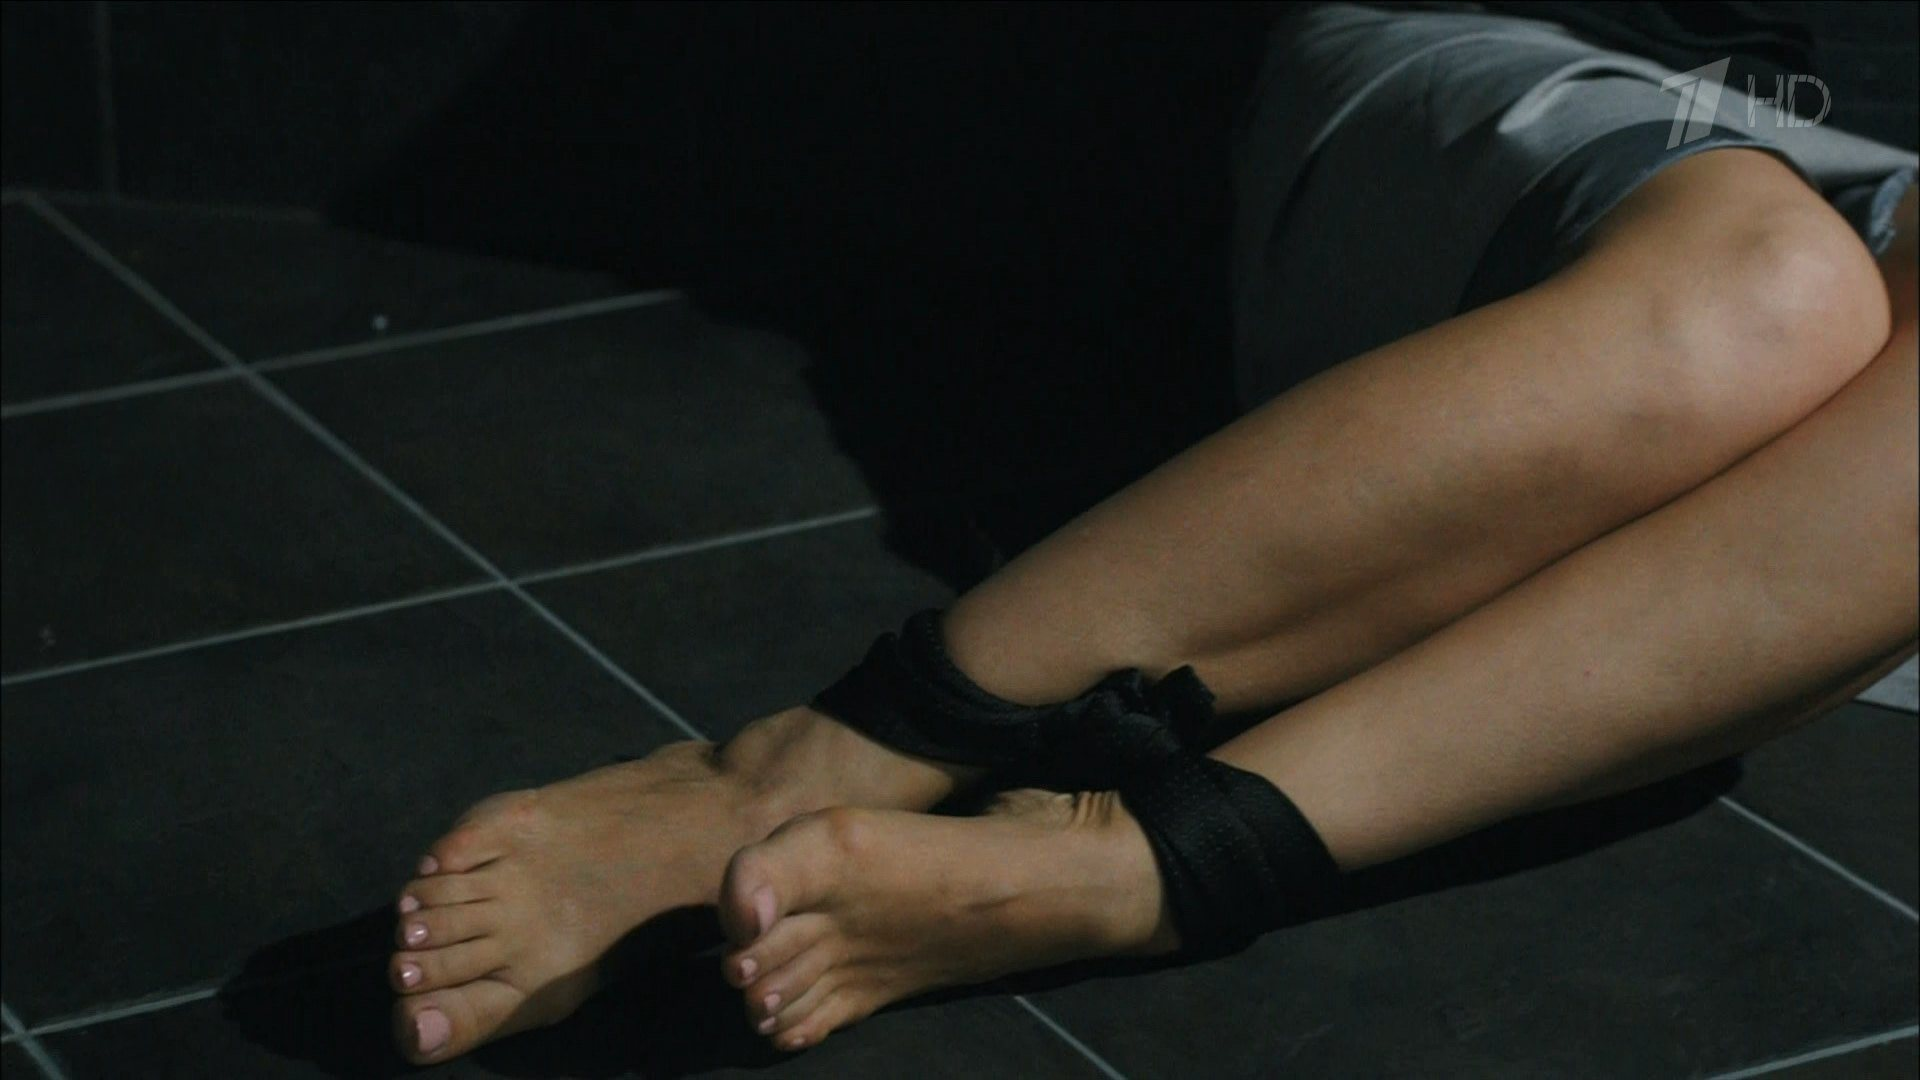 https://pics.wikifeet.com/Ekaterina-Guseva-Feet-2457995.jpg